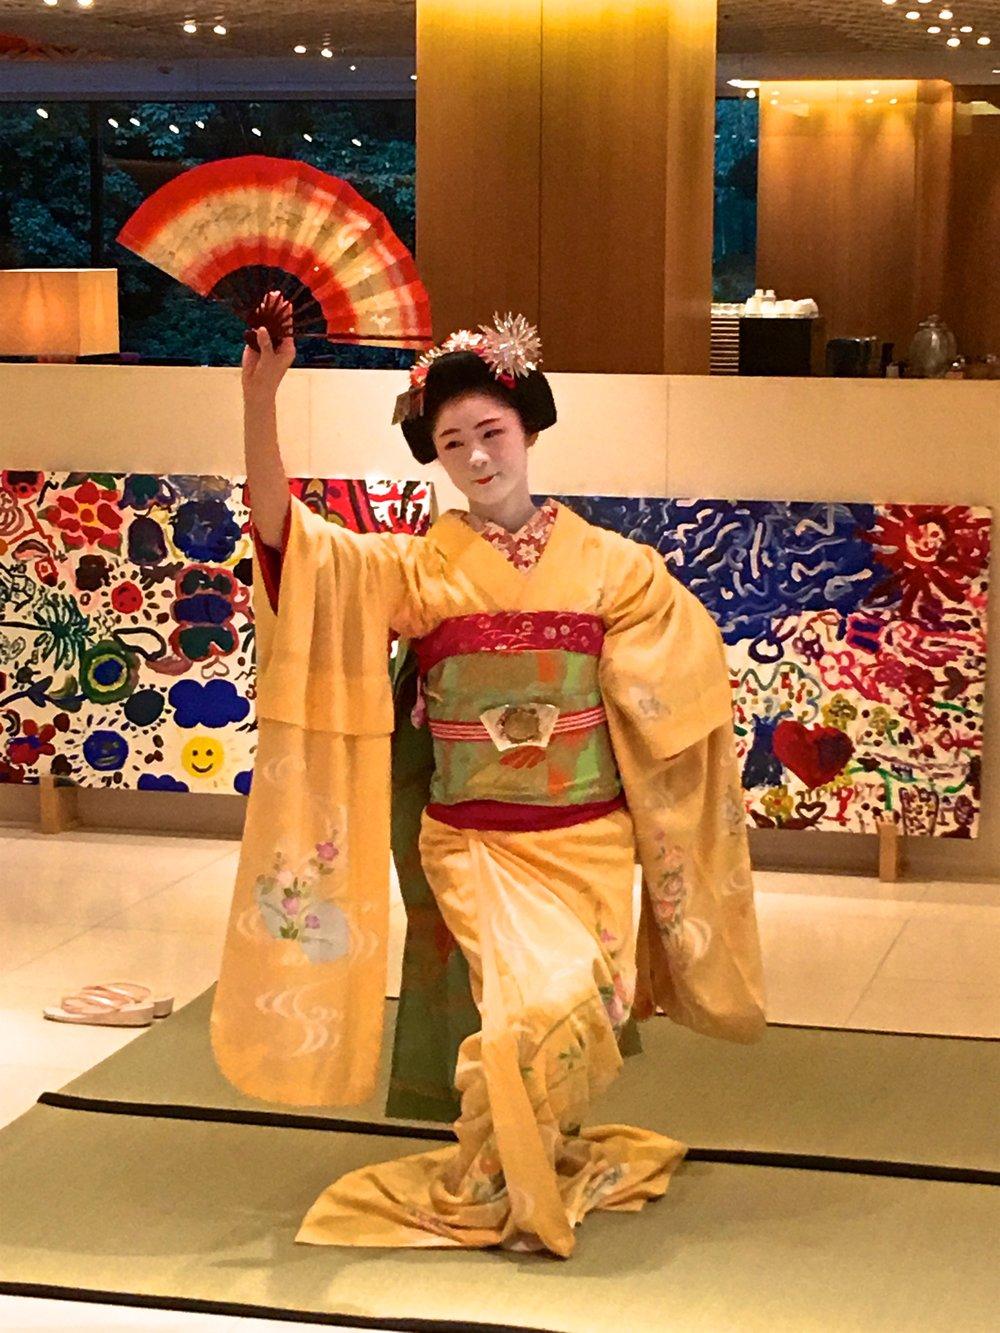 teri_kyoto_Maikodancing_spiritedtable_photo1.jpg